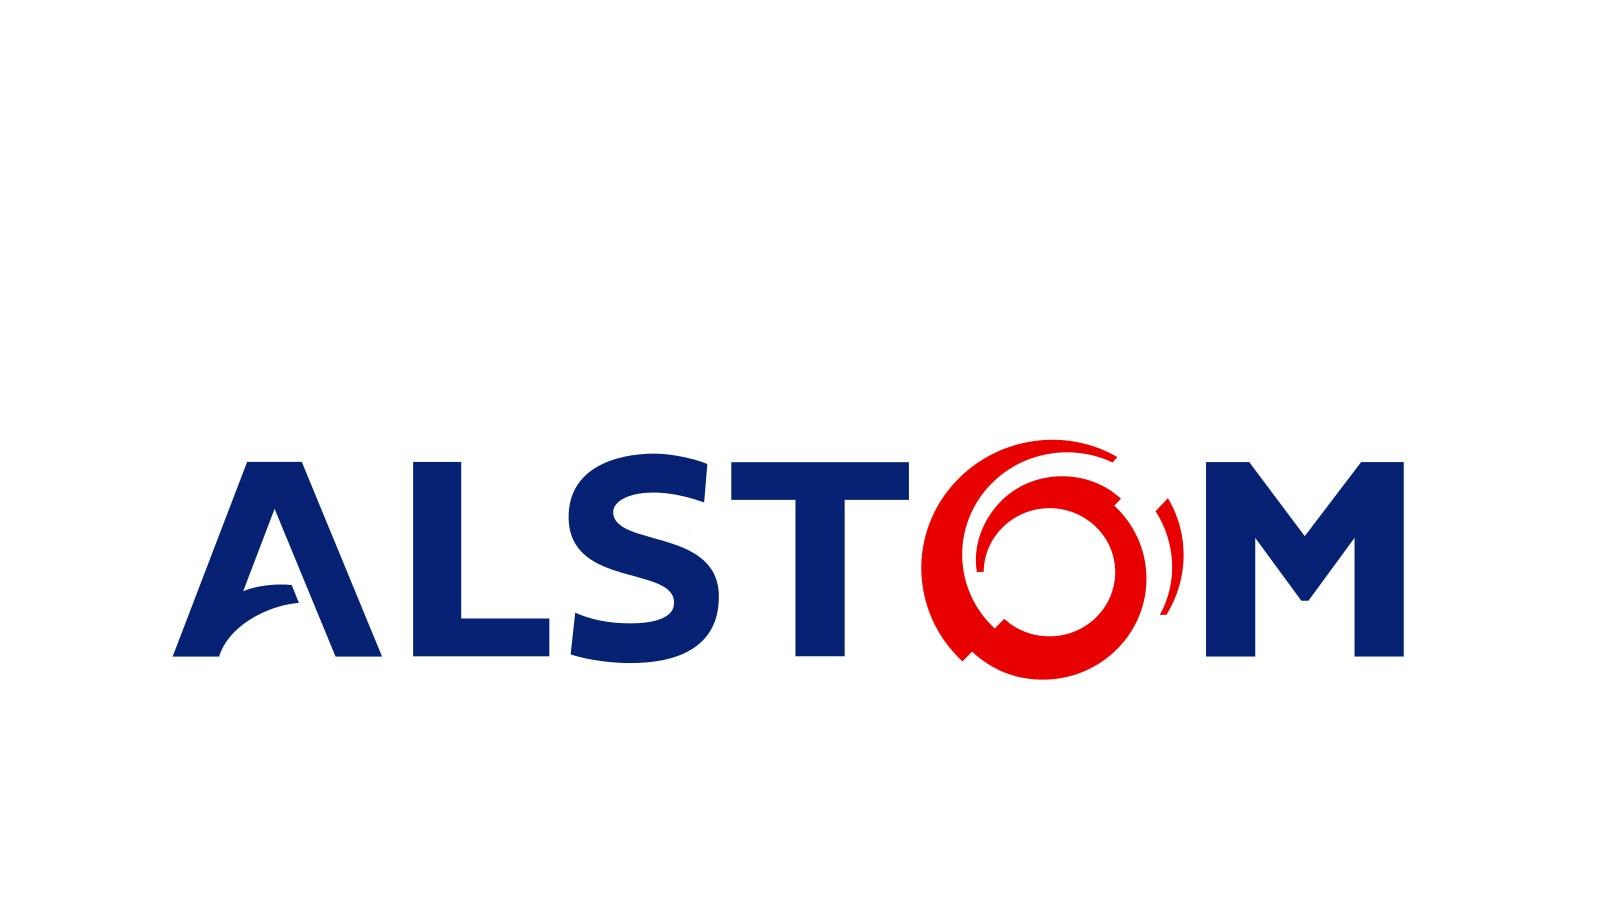 Alstom Chooses Asite